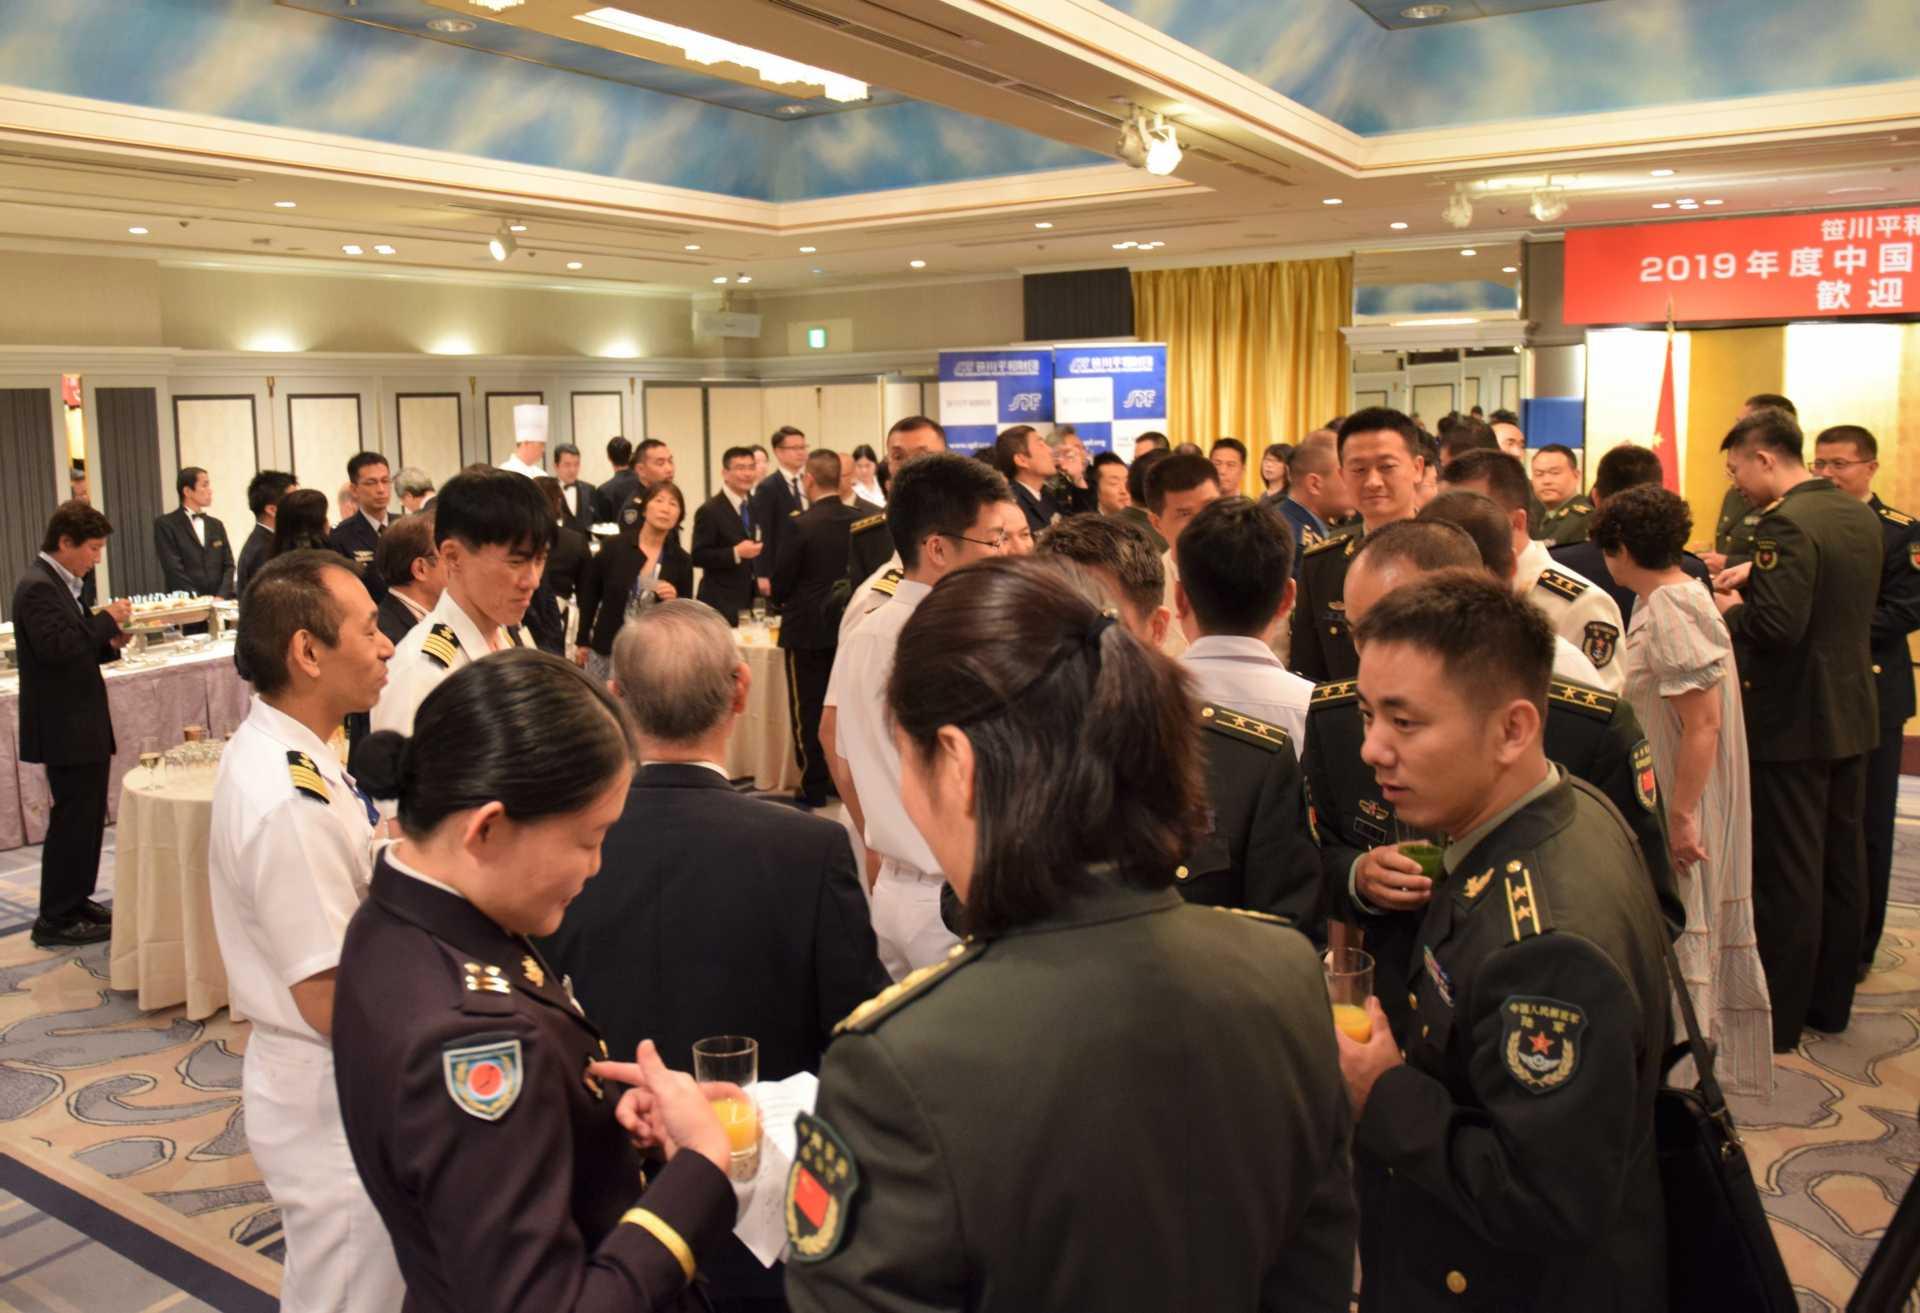 日中佐官級交流事業2019 中国人民解放軍代表団歓迎レセプション